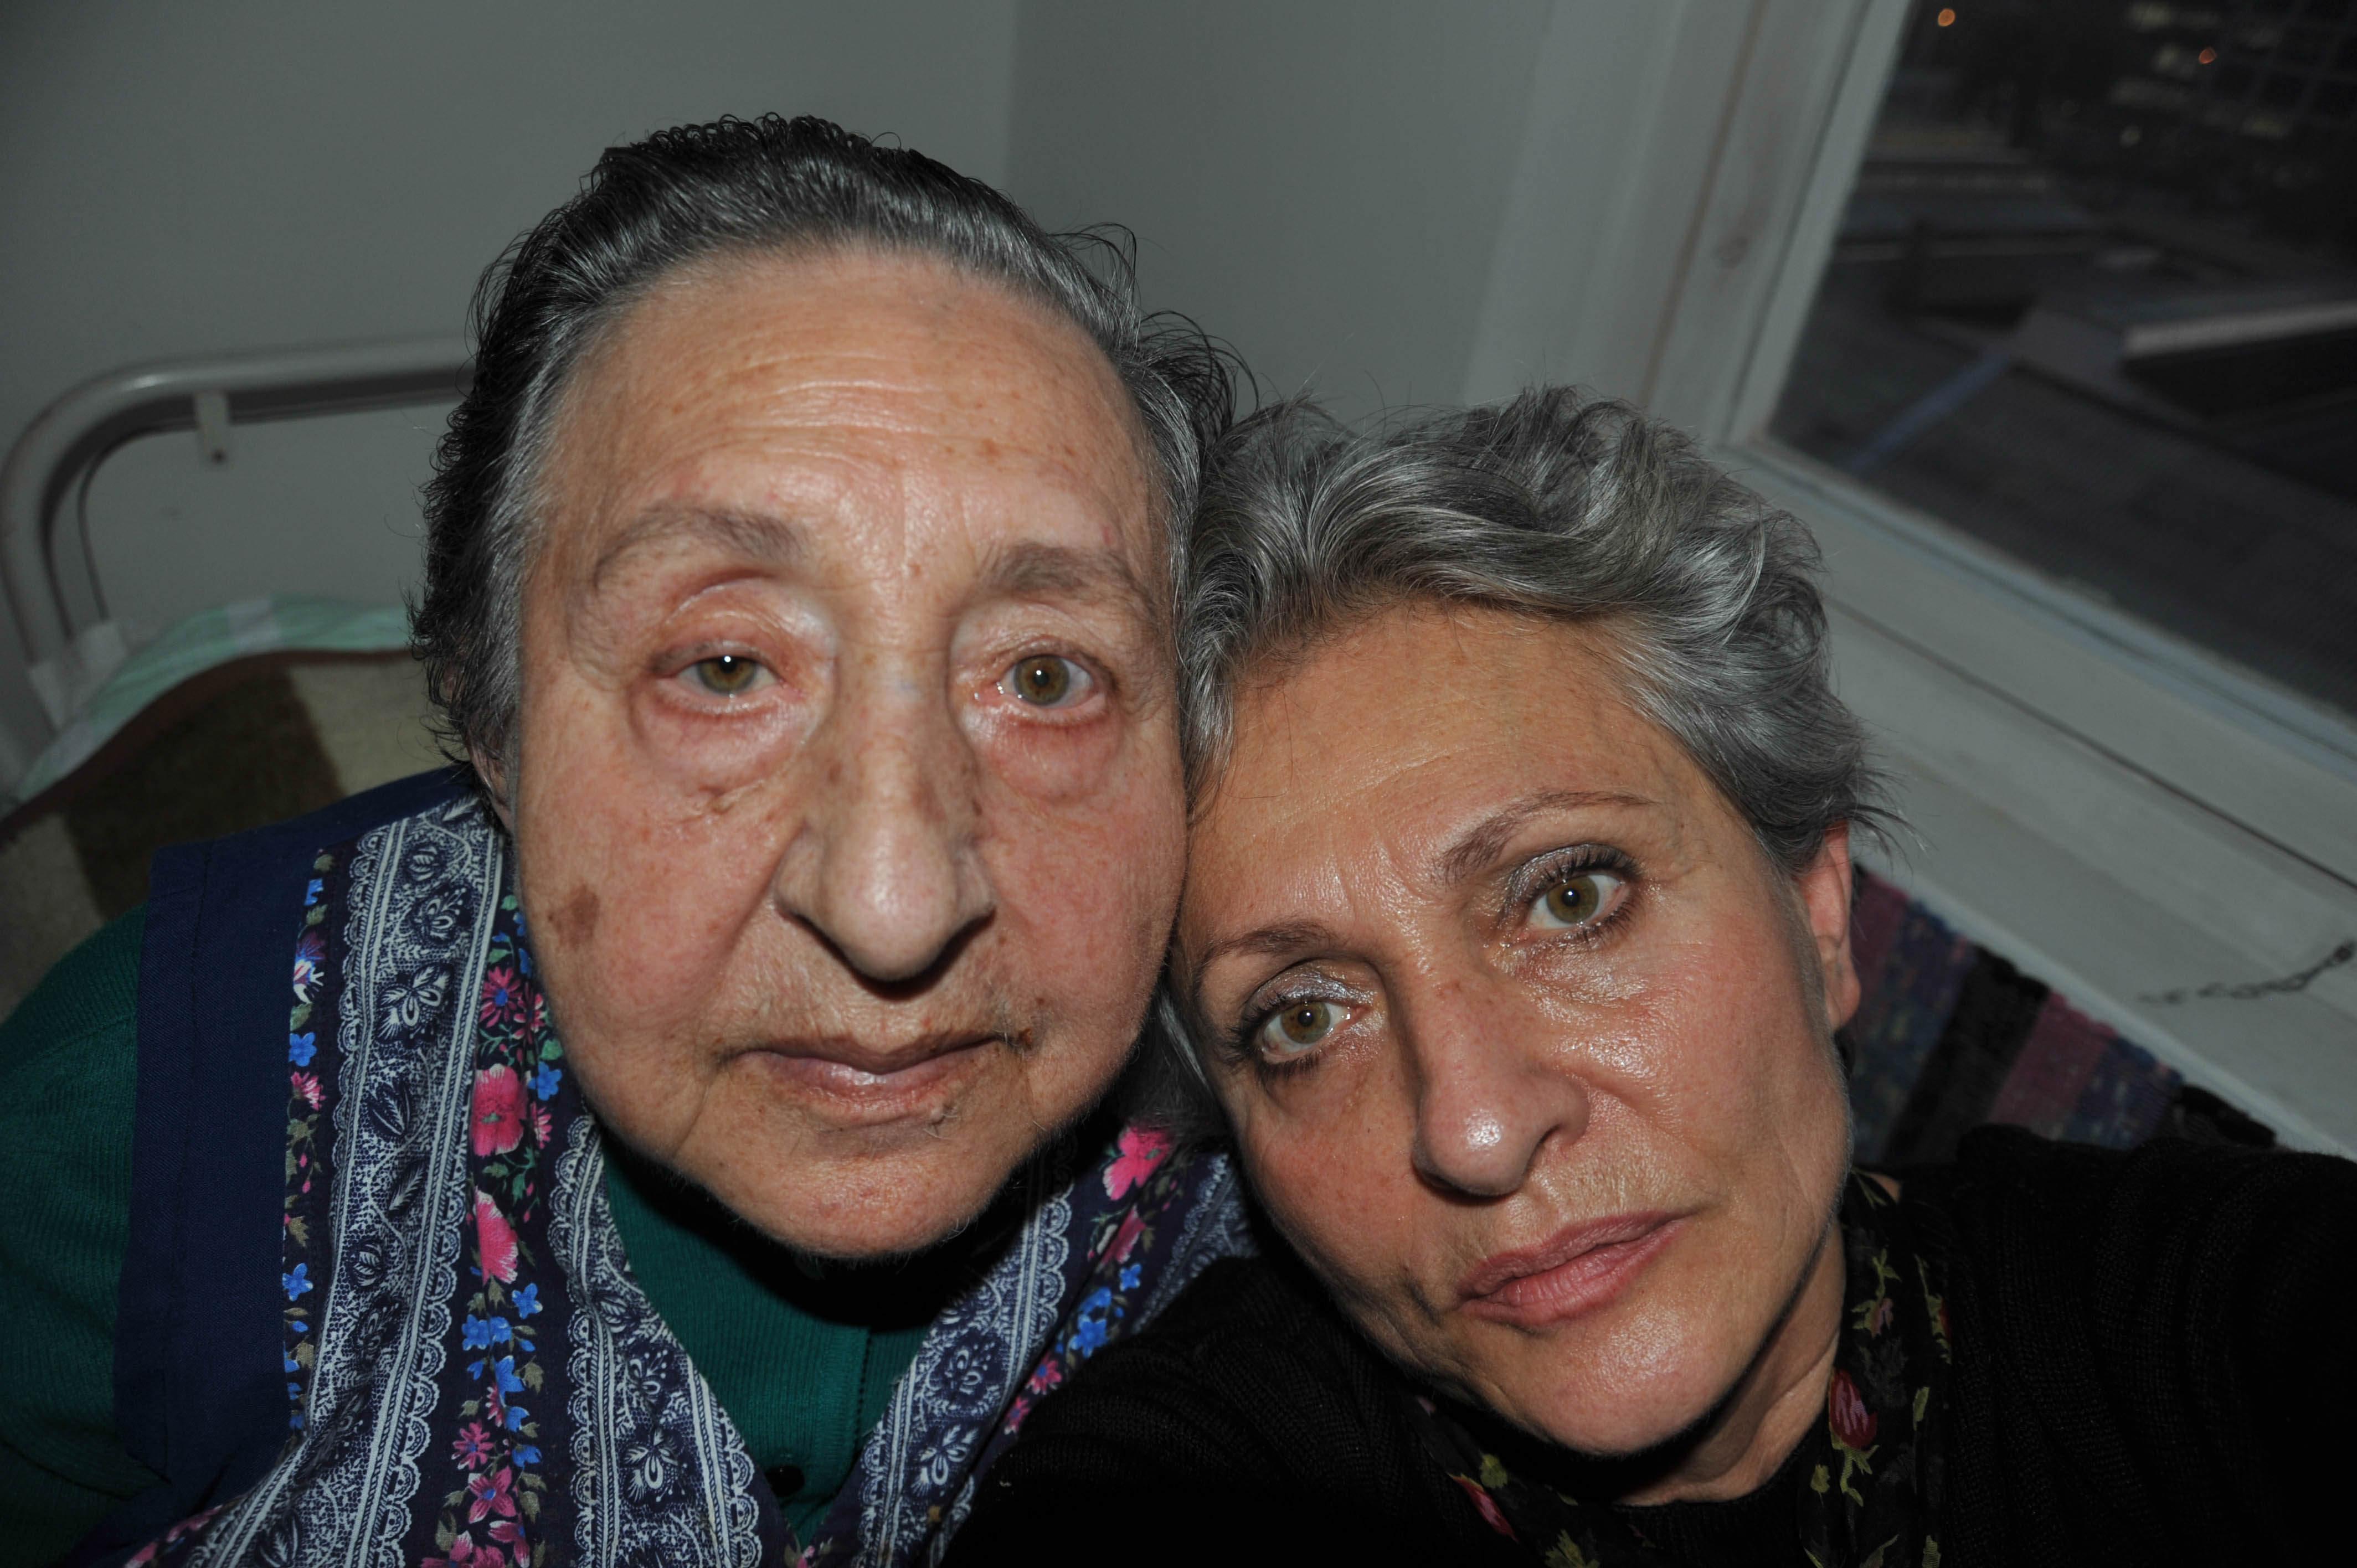 Horváth M. Judit: Privát képek II., 2013–2015 © Horváth M. Judit